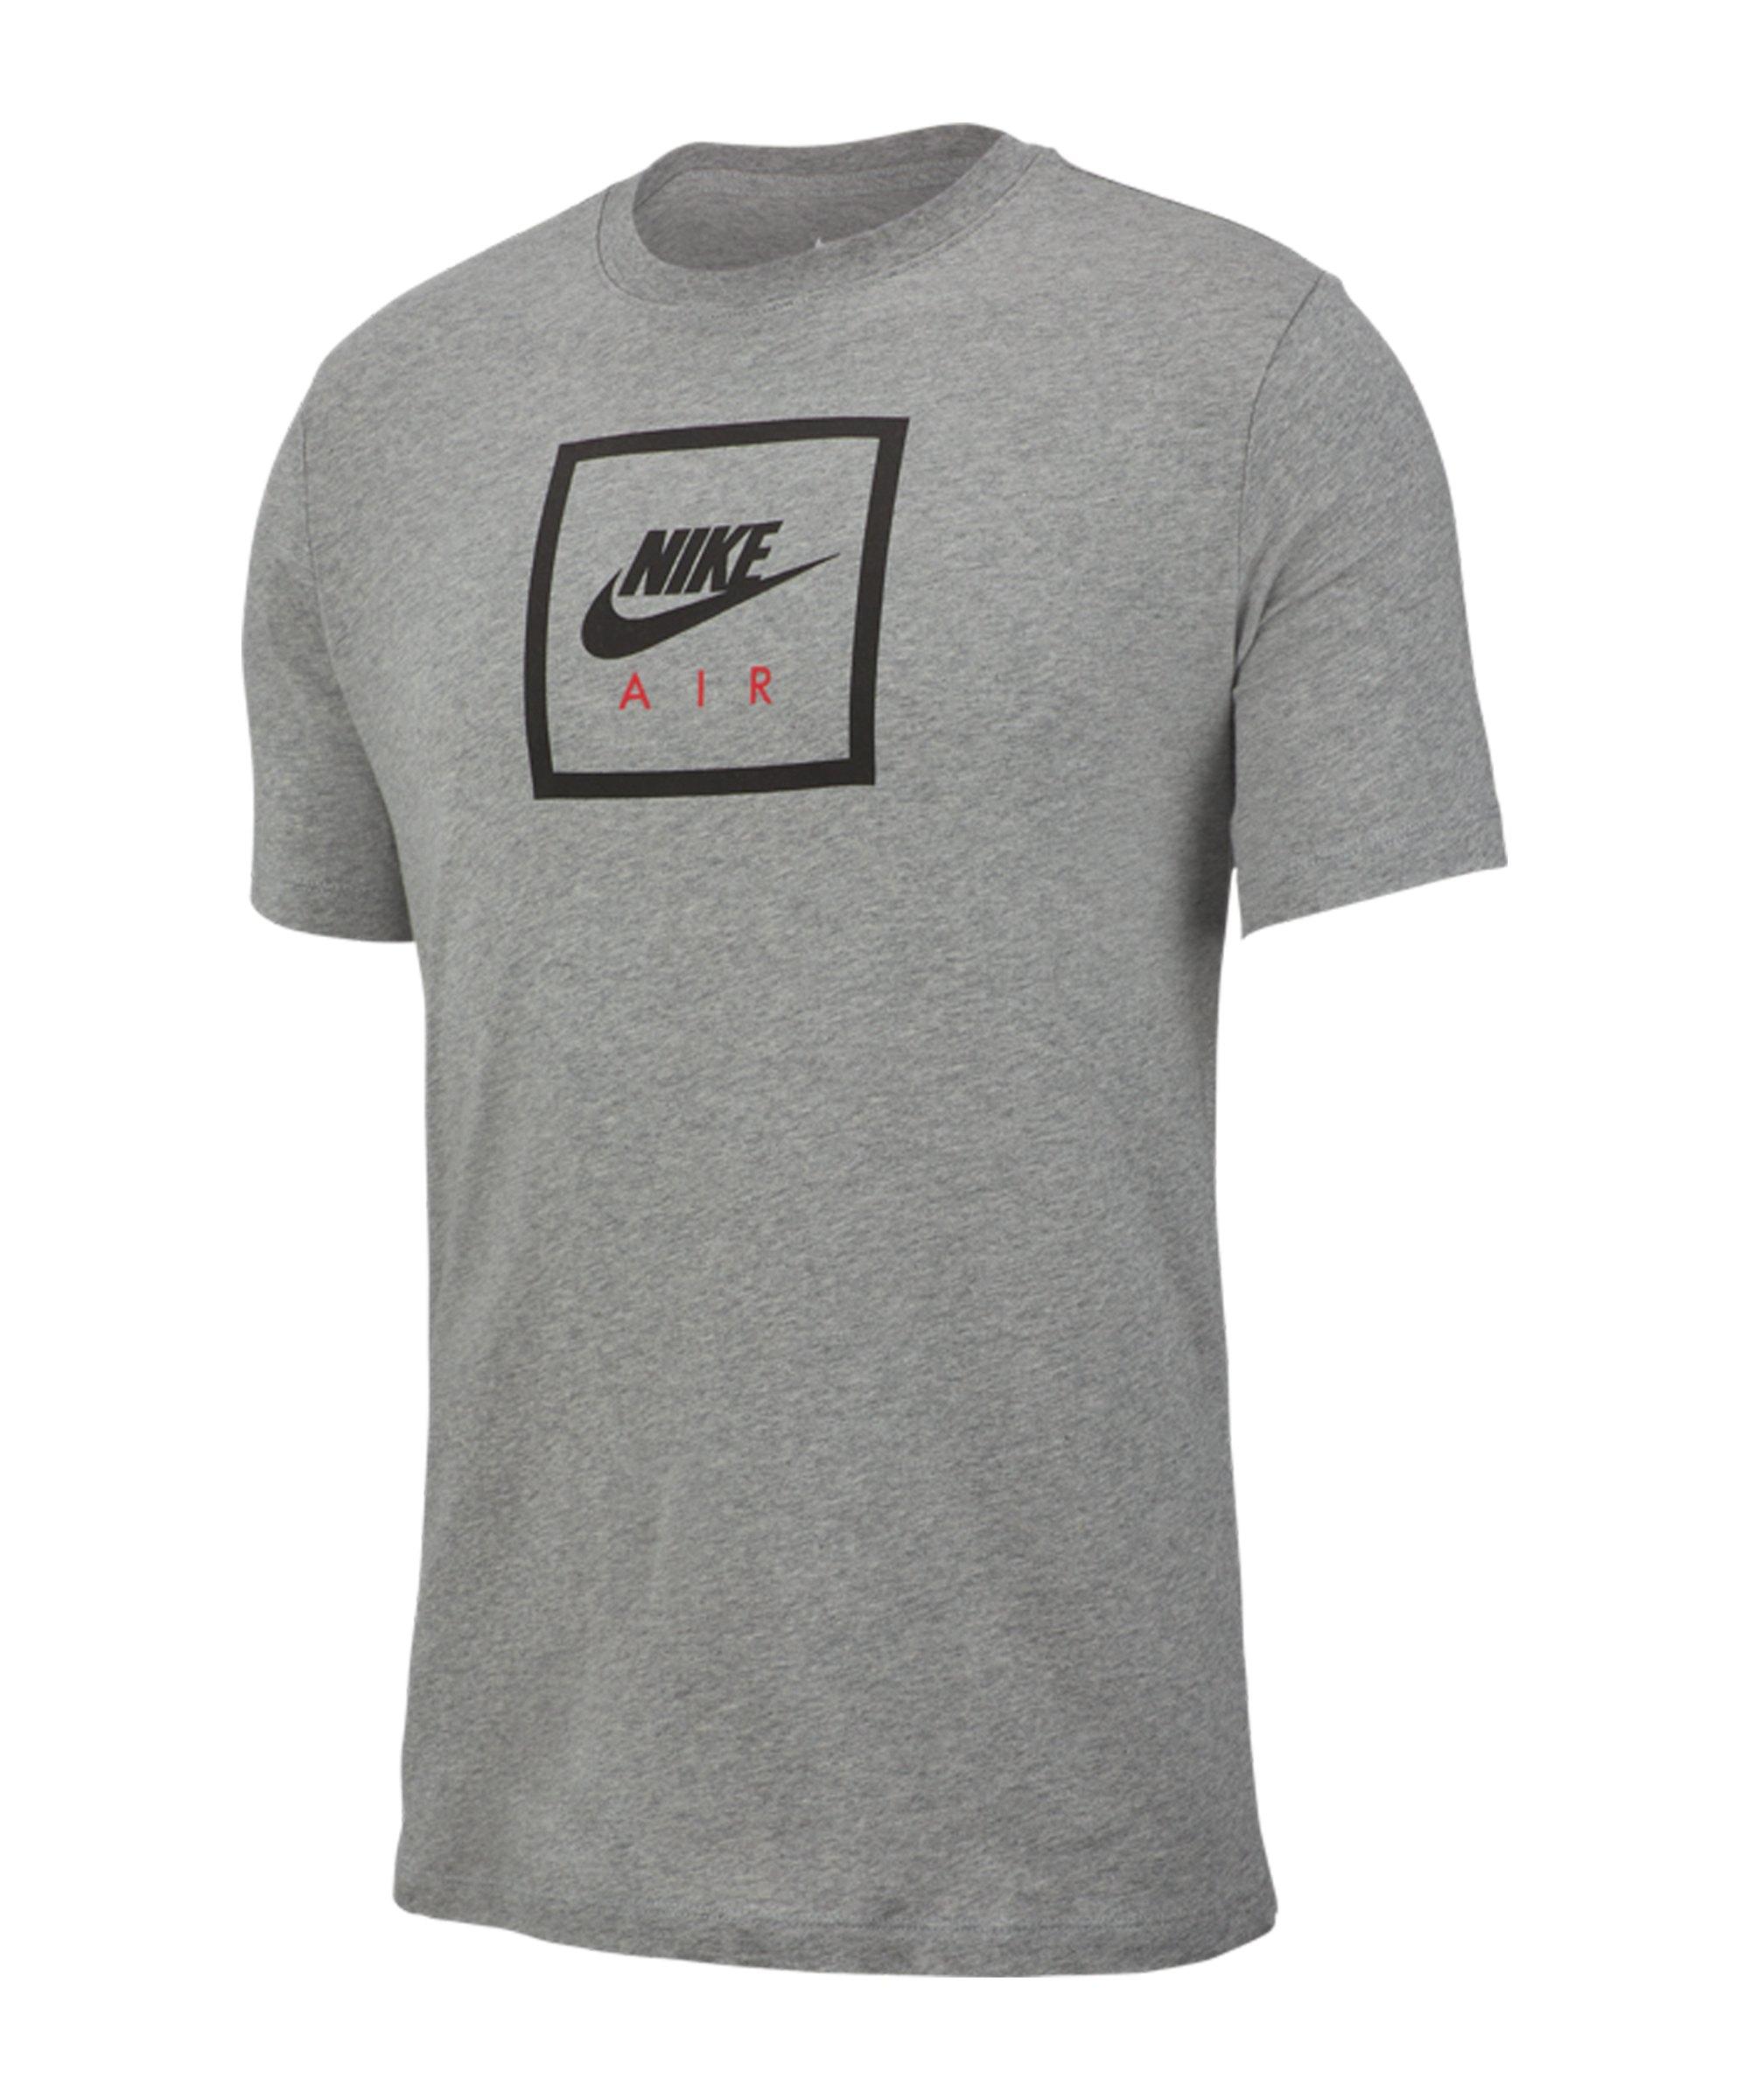 Nike Air 2 Tee T-Shirt Grau F063 - grau